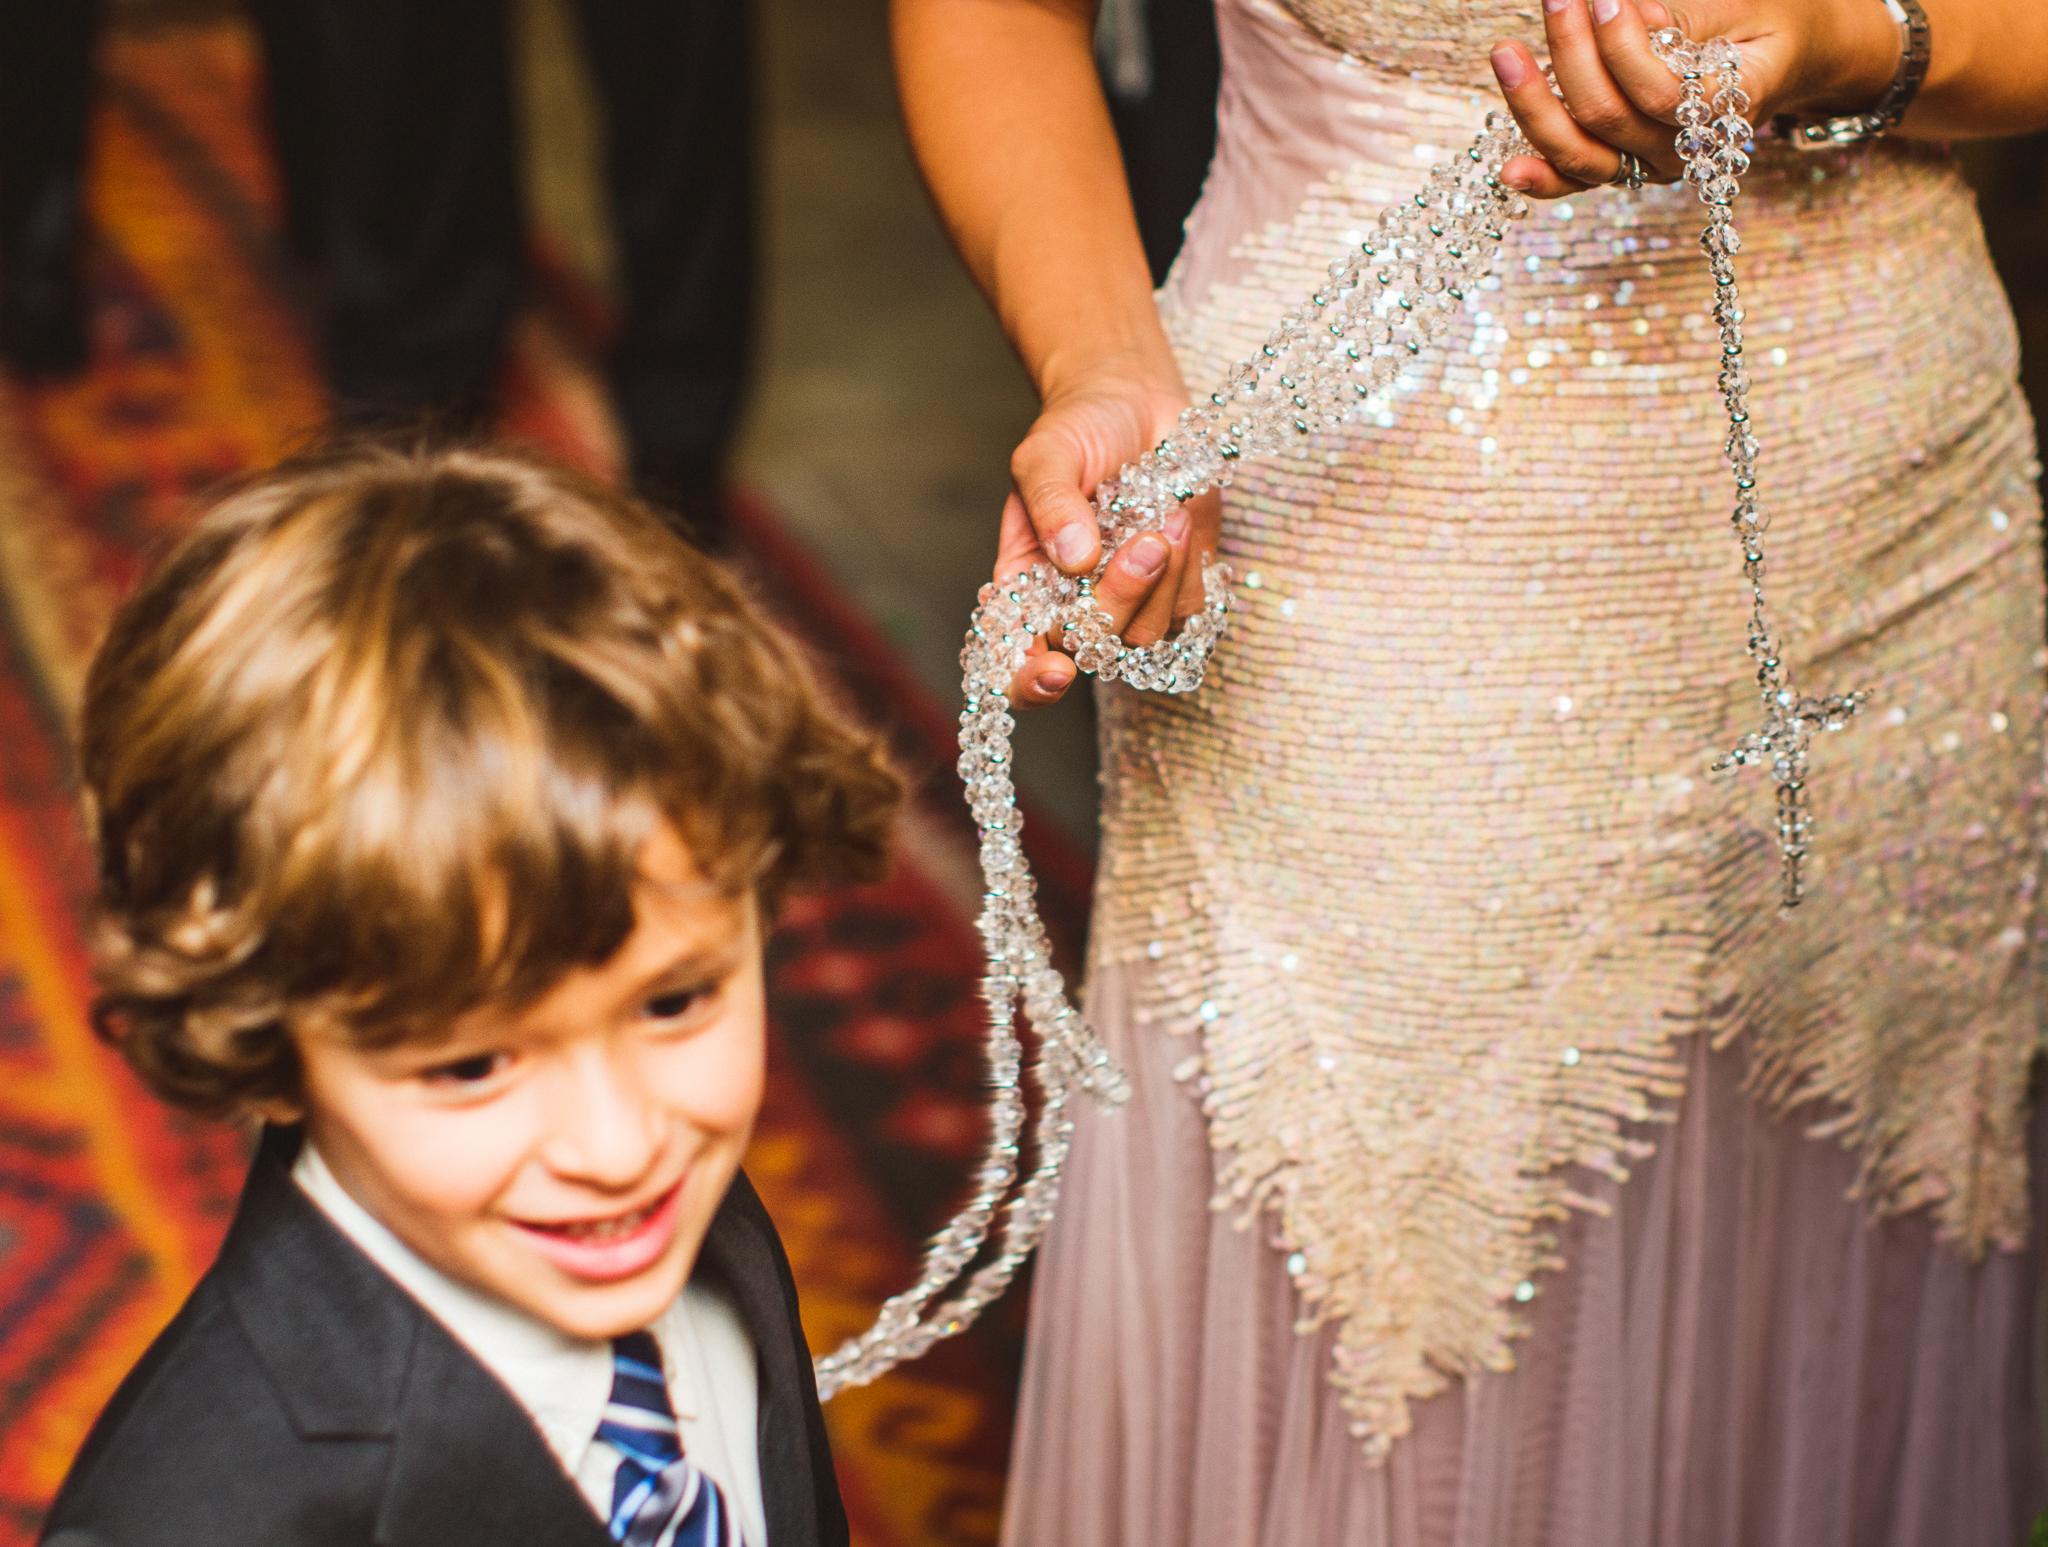 artistic-wedding-photo.jpg